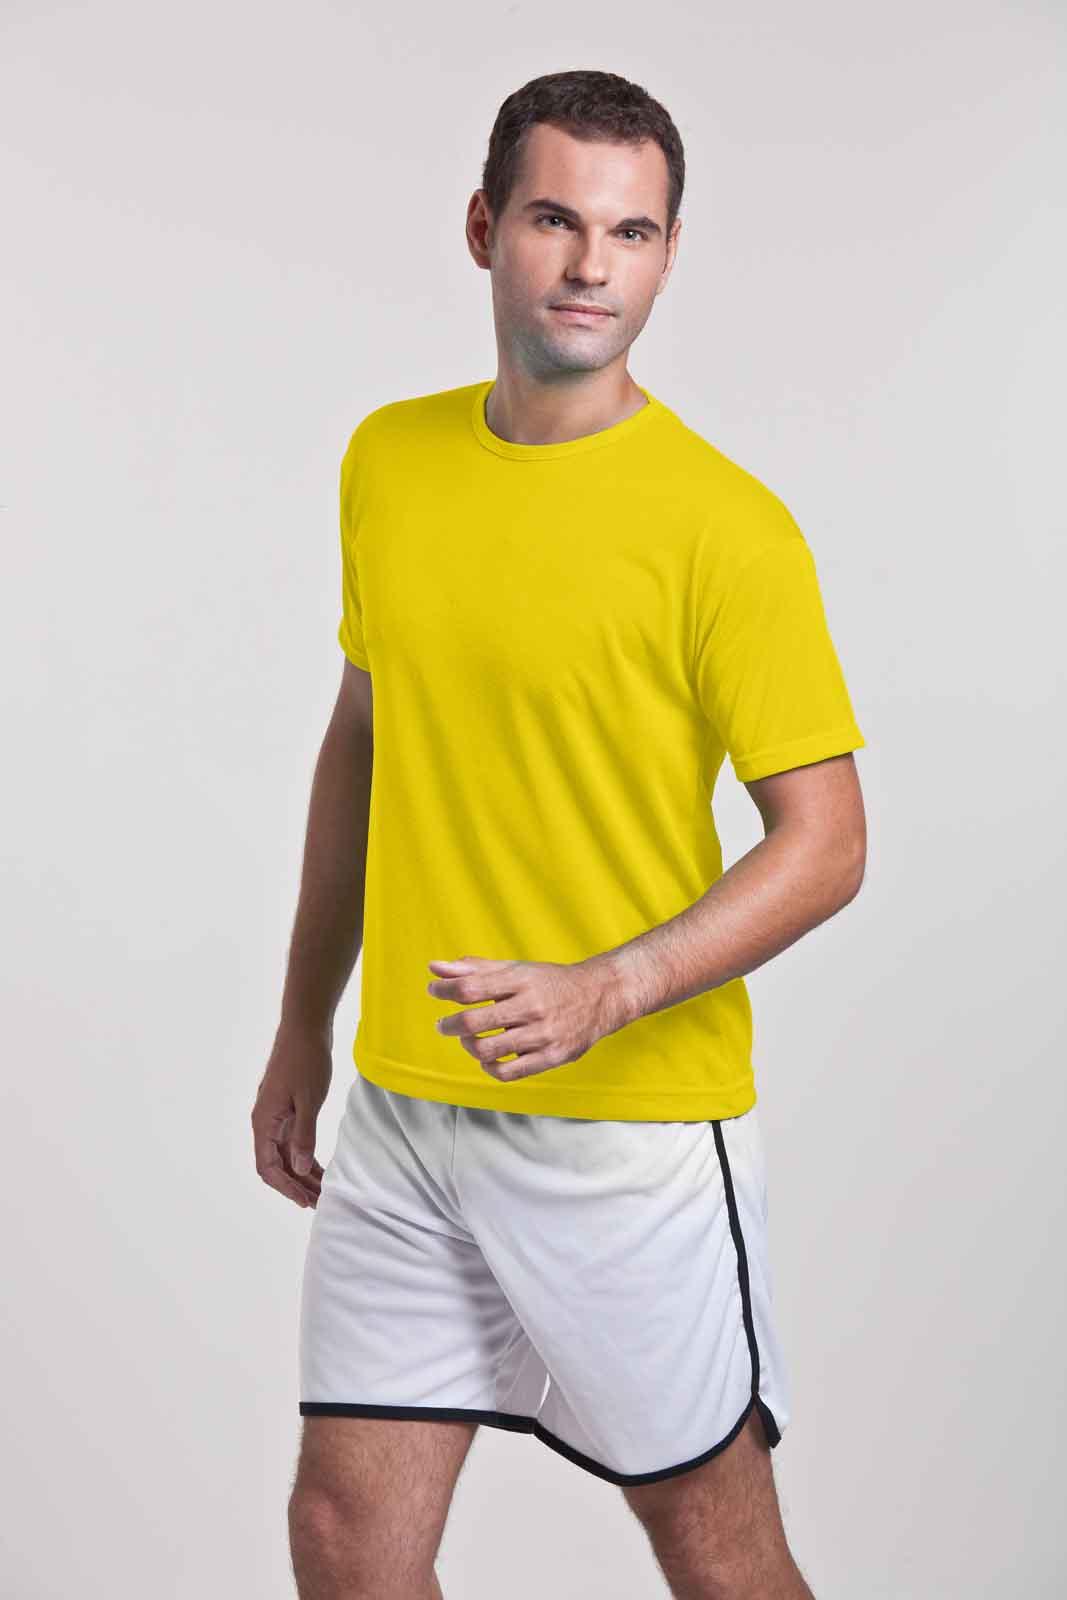 Homem vestindo camiseta helanca